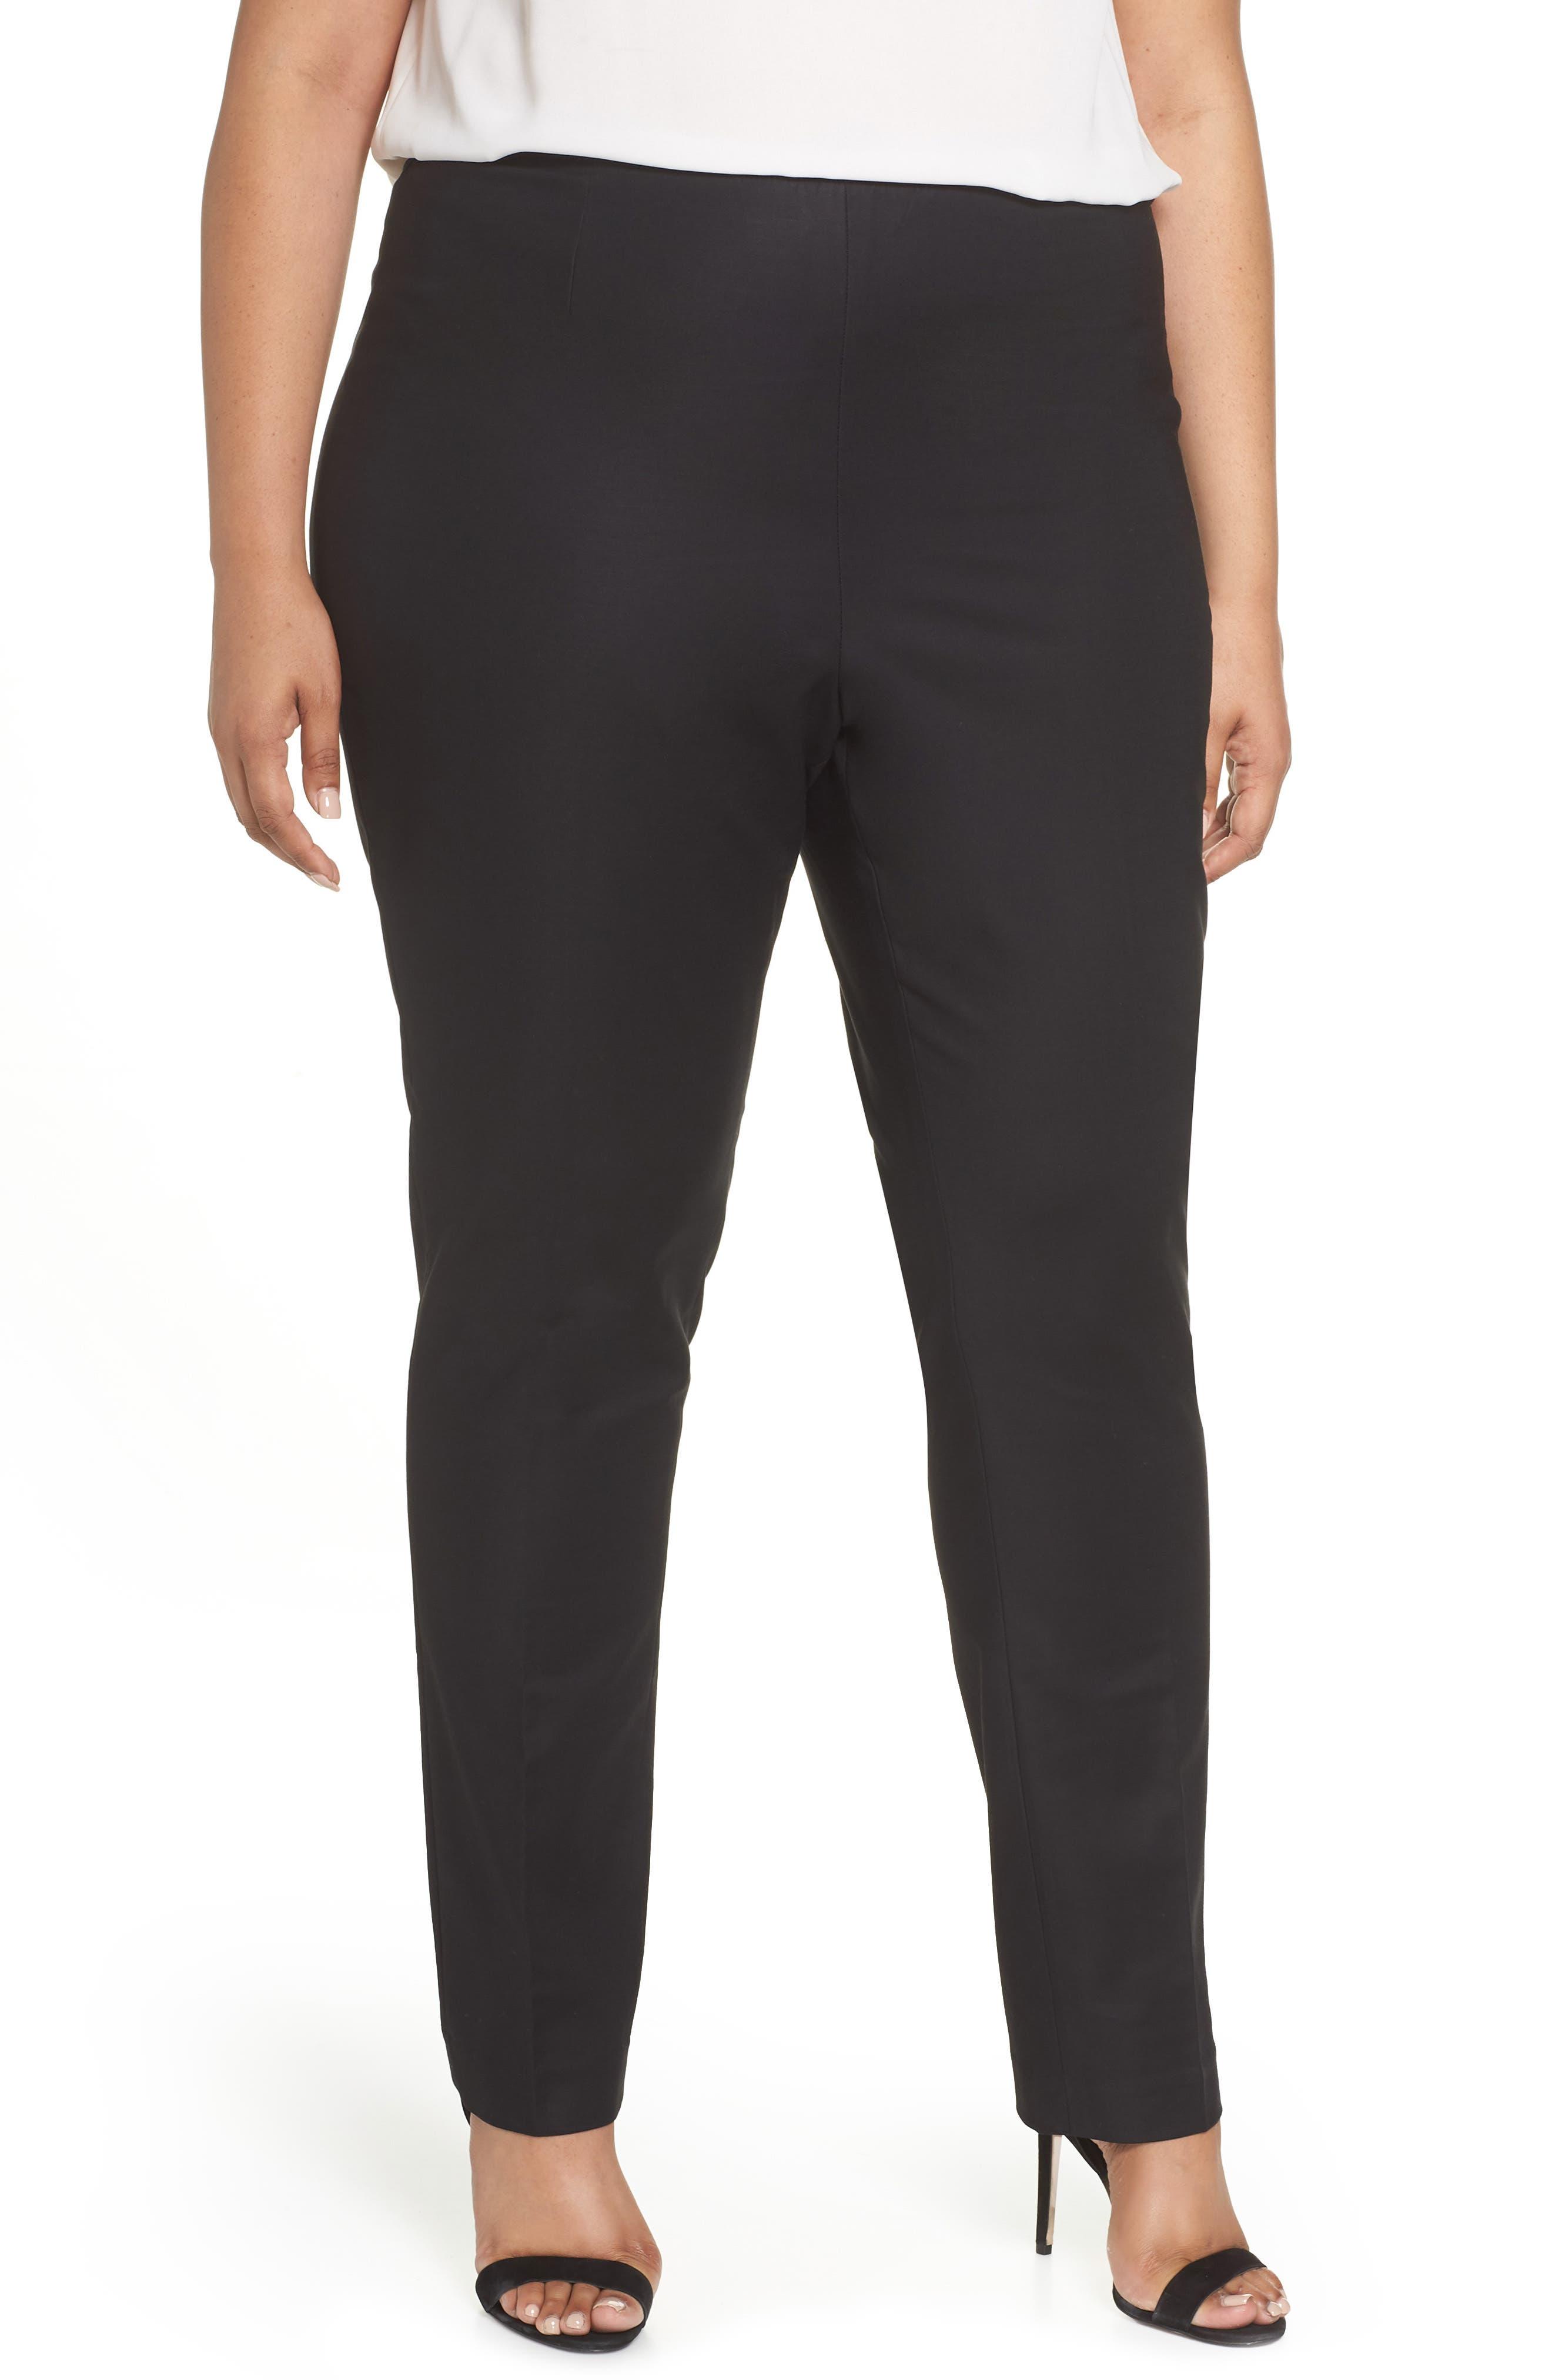 NIC+ZOE, 'Perfect' Side Zip Pants, Main thumbnail 1, color, BLACK ONYX